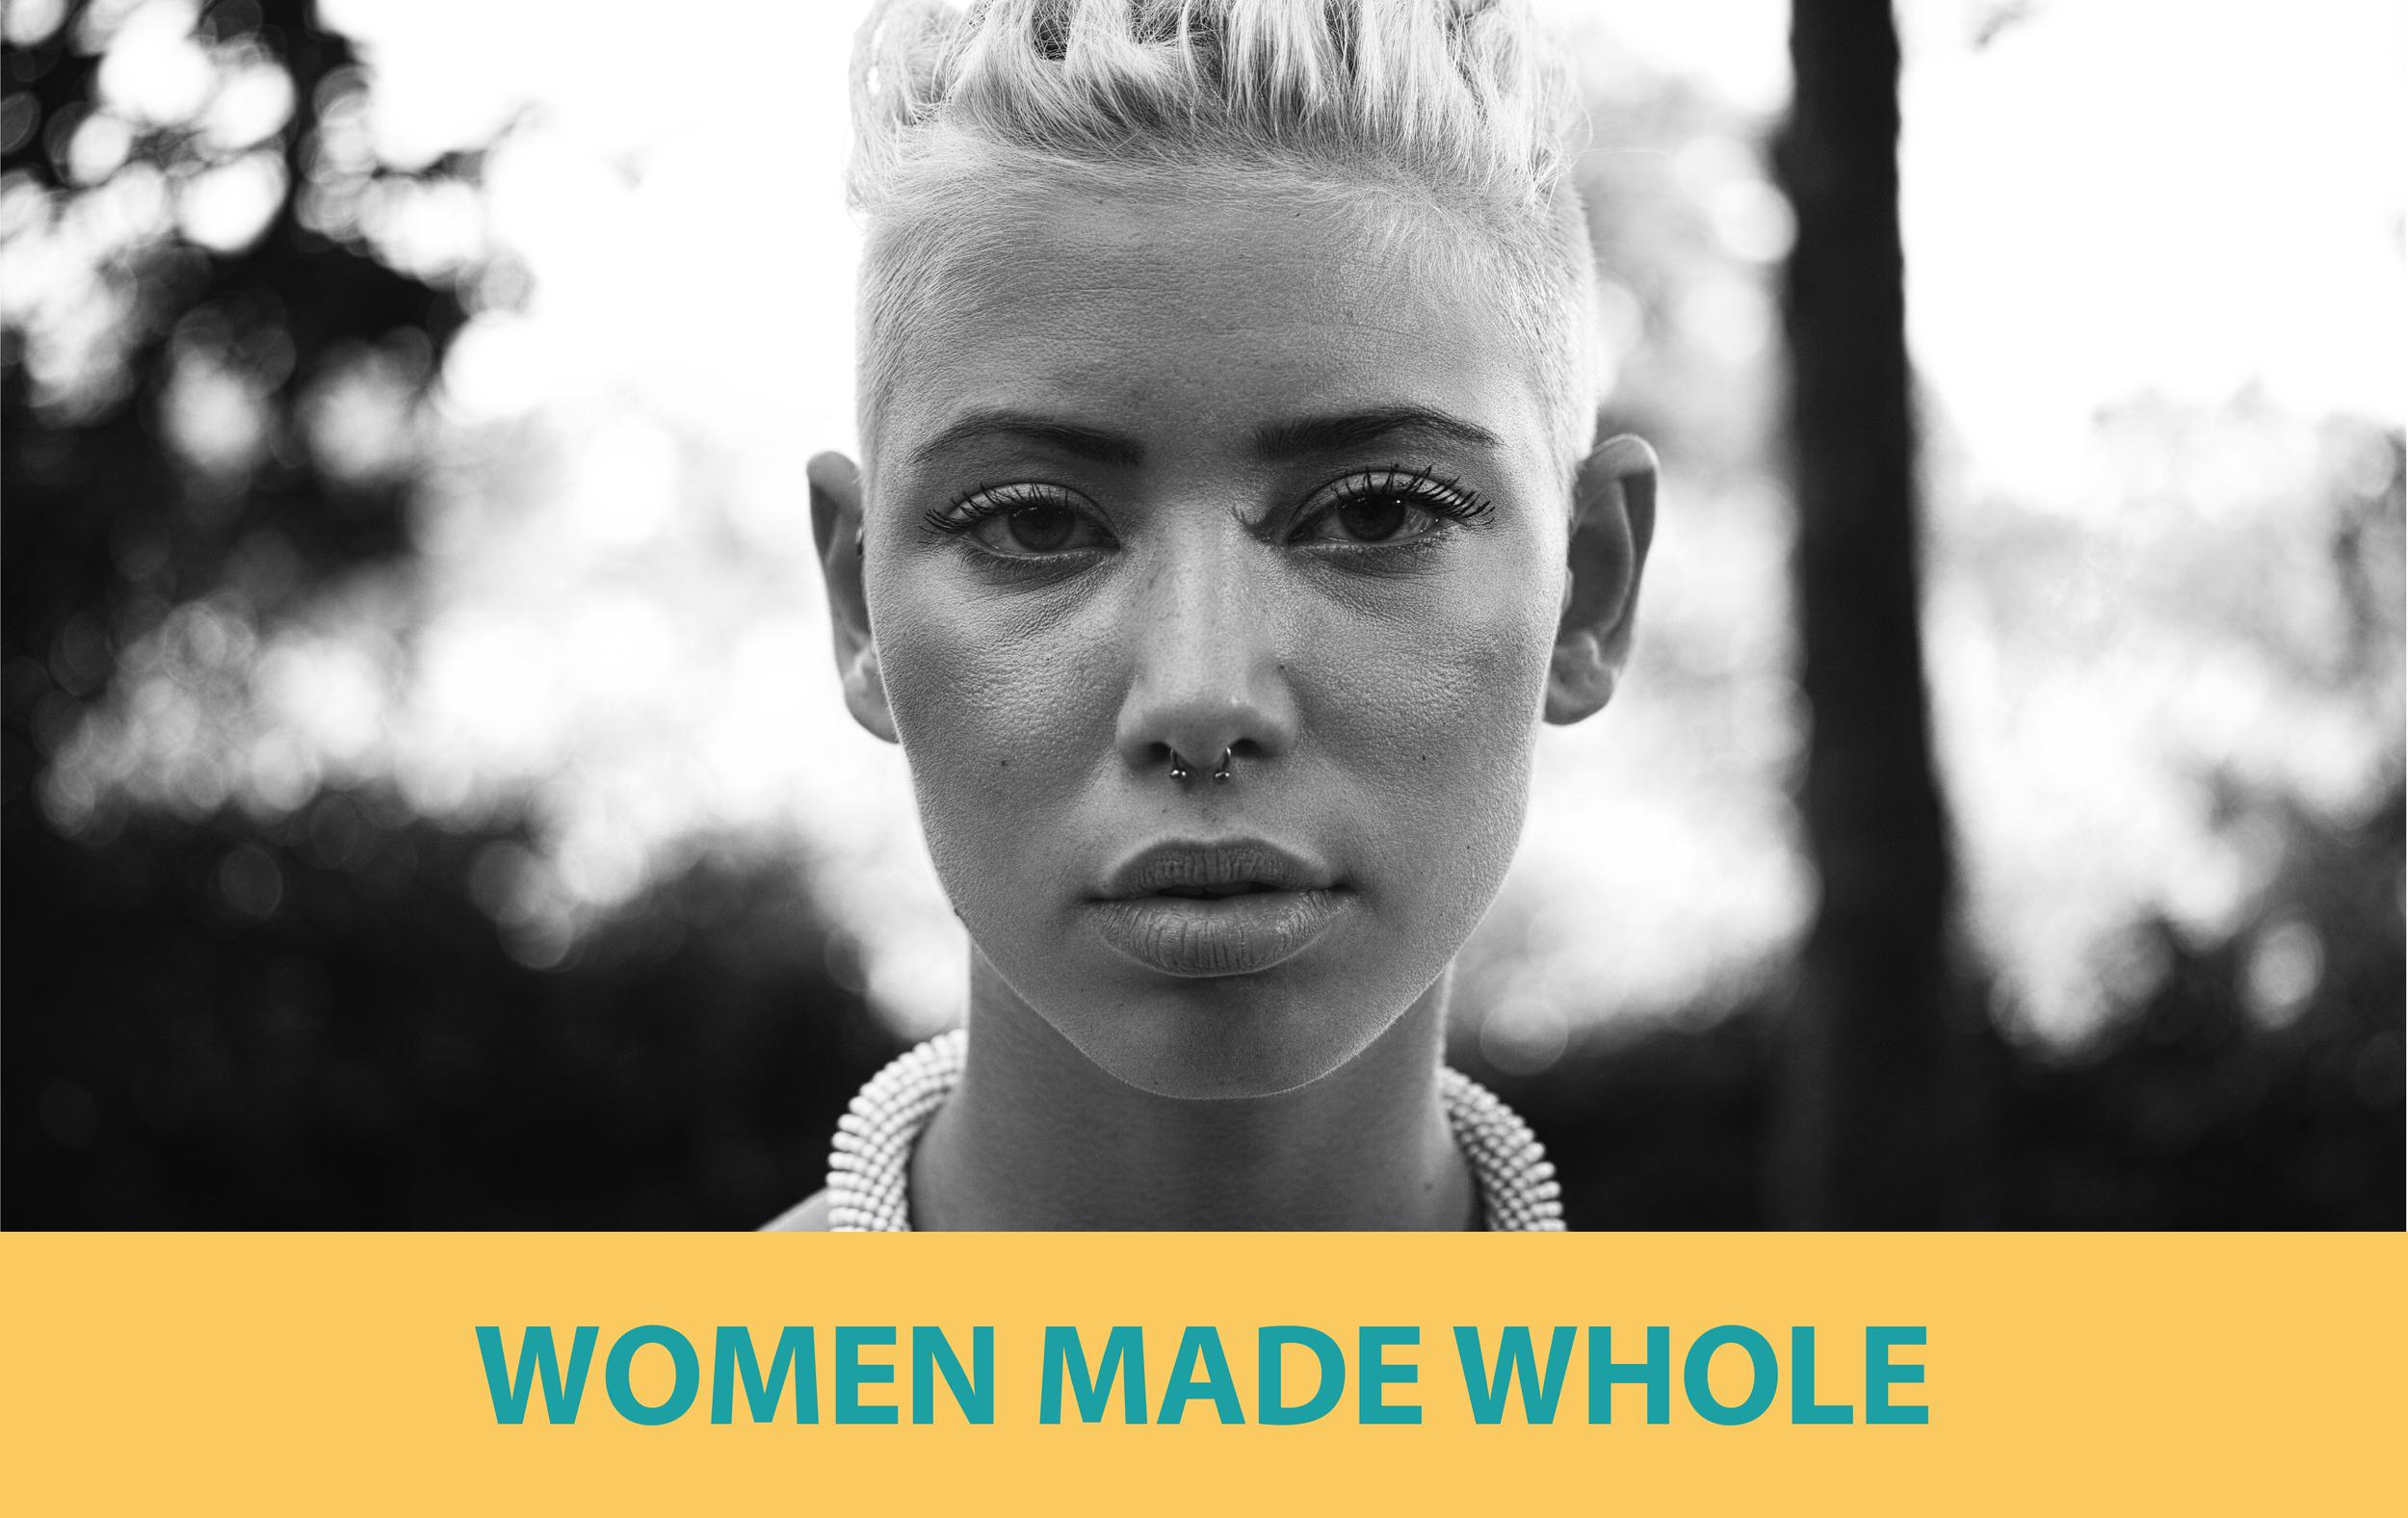 SENBAN_WOMEN MADE WHOLE .png